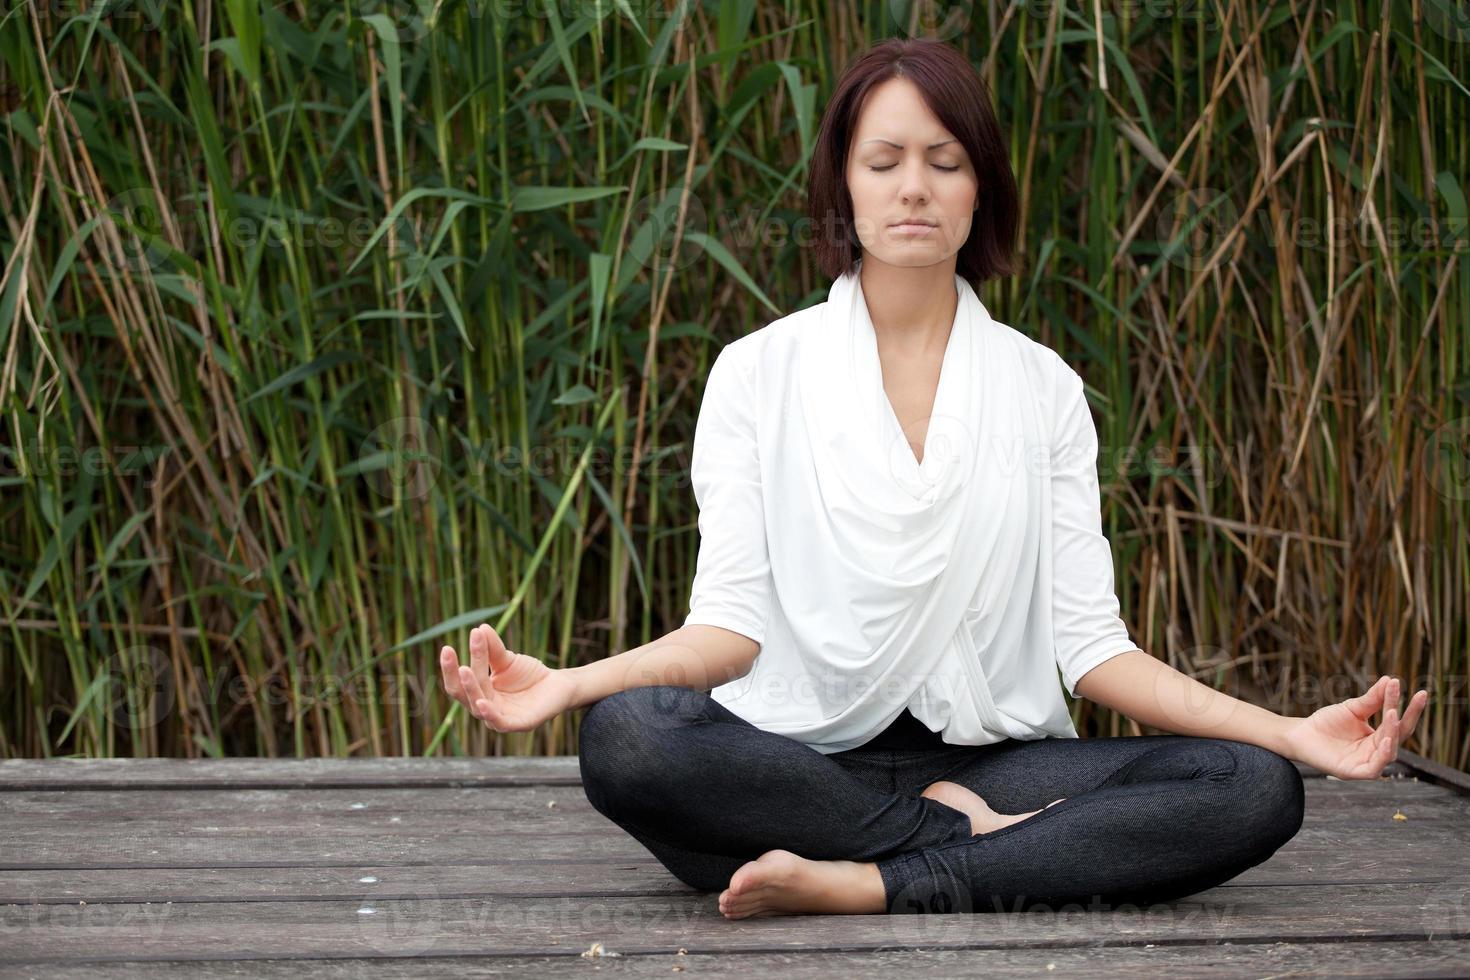 stile yoga foto